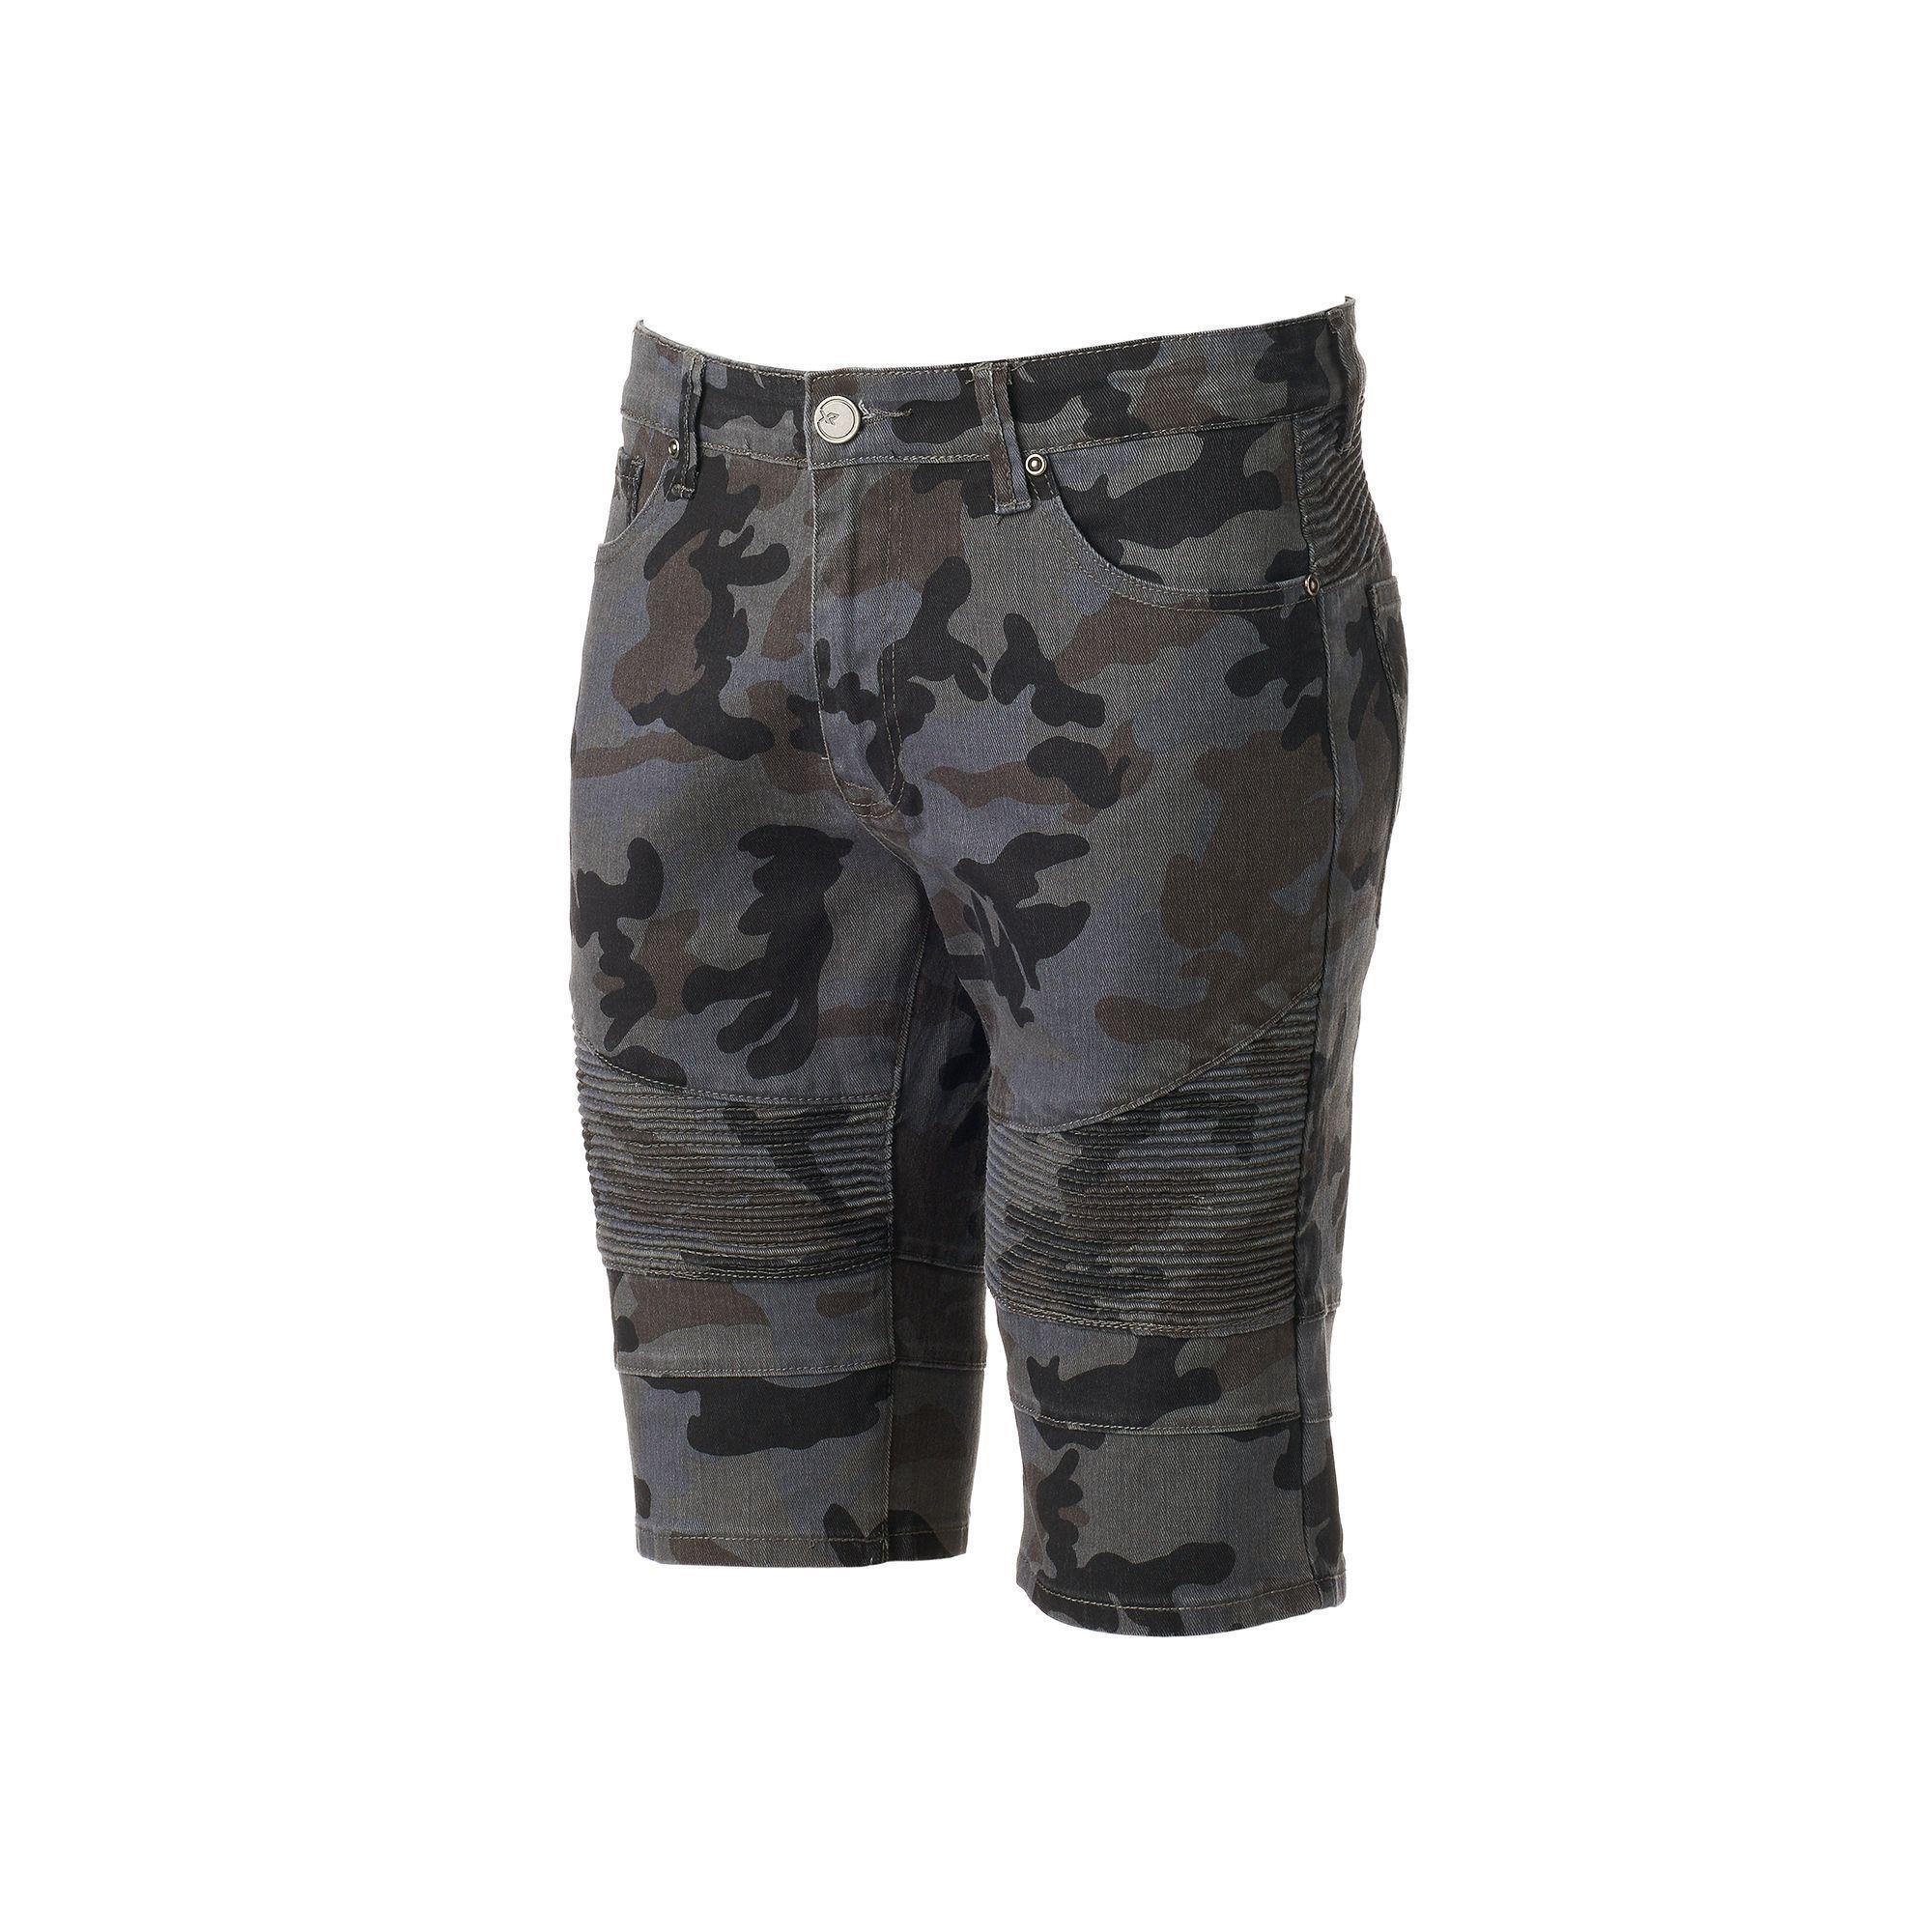 d9593b637a Men's Xray Slim-Fit Camo Moto Stretch Denim Shorts, Size: 40, Grey